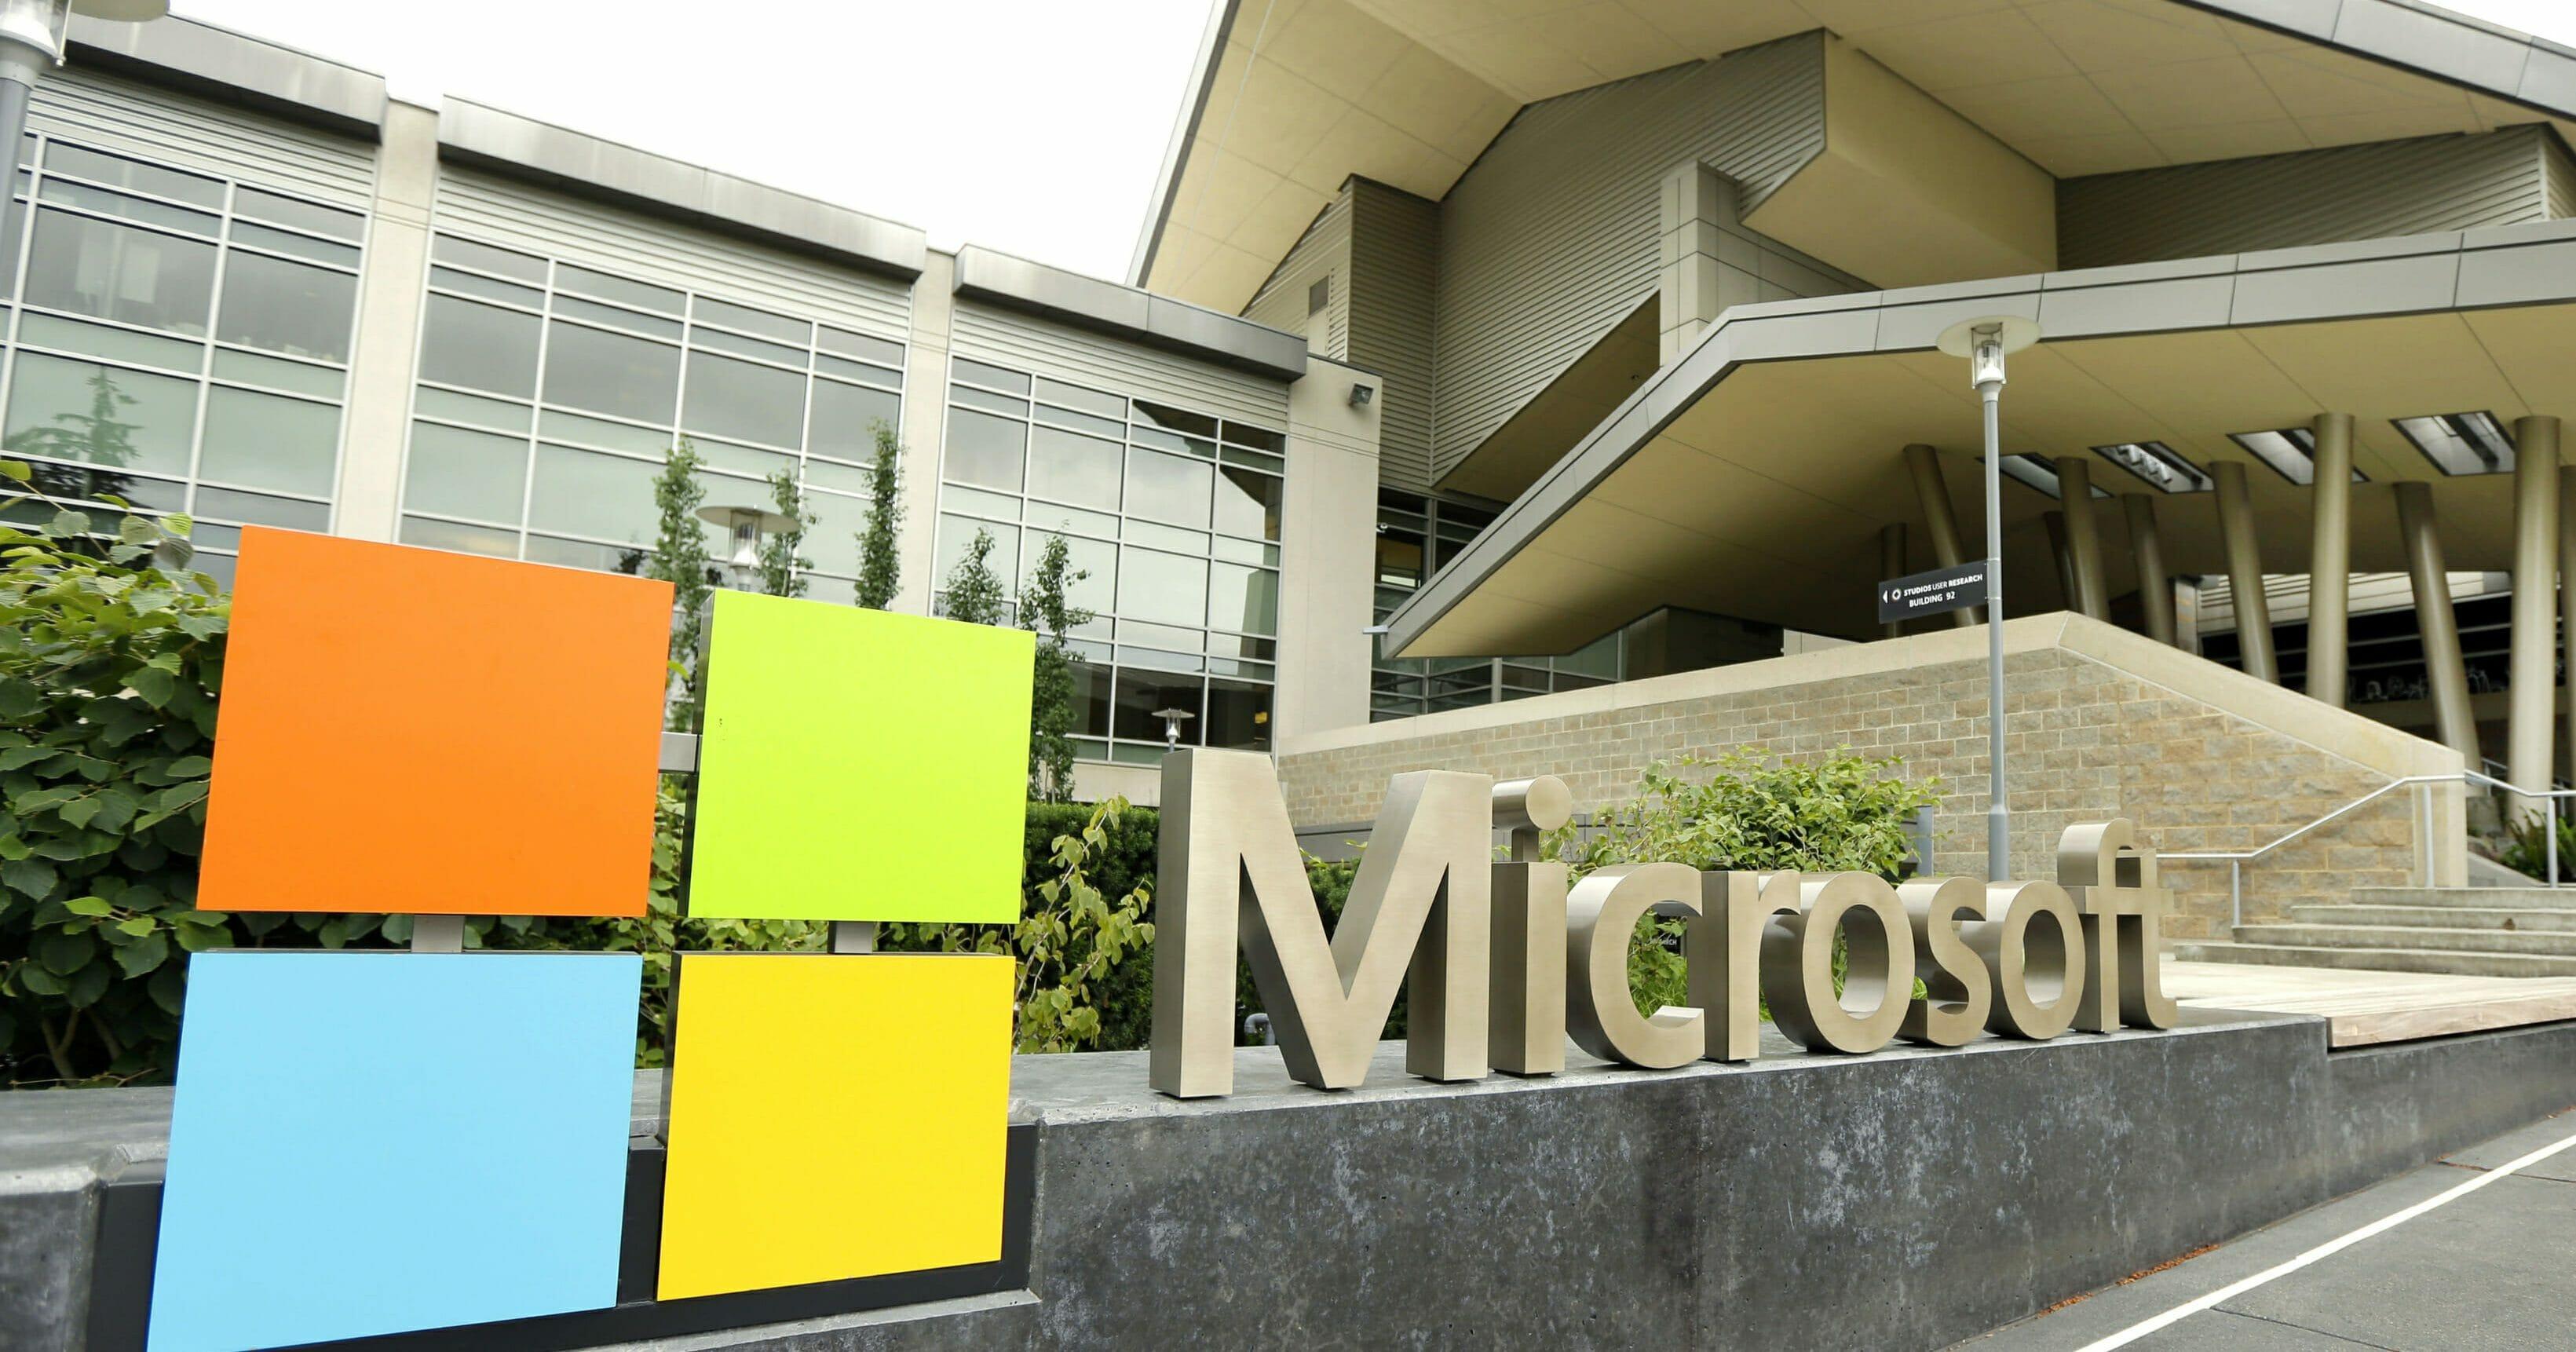 The Microsoft Visitor Center in Redmond, Washington.